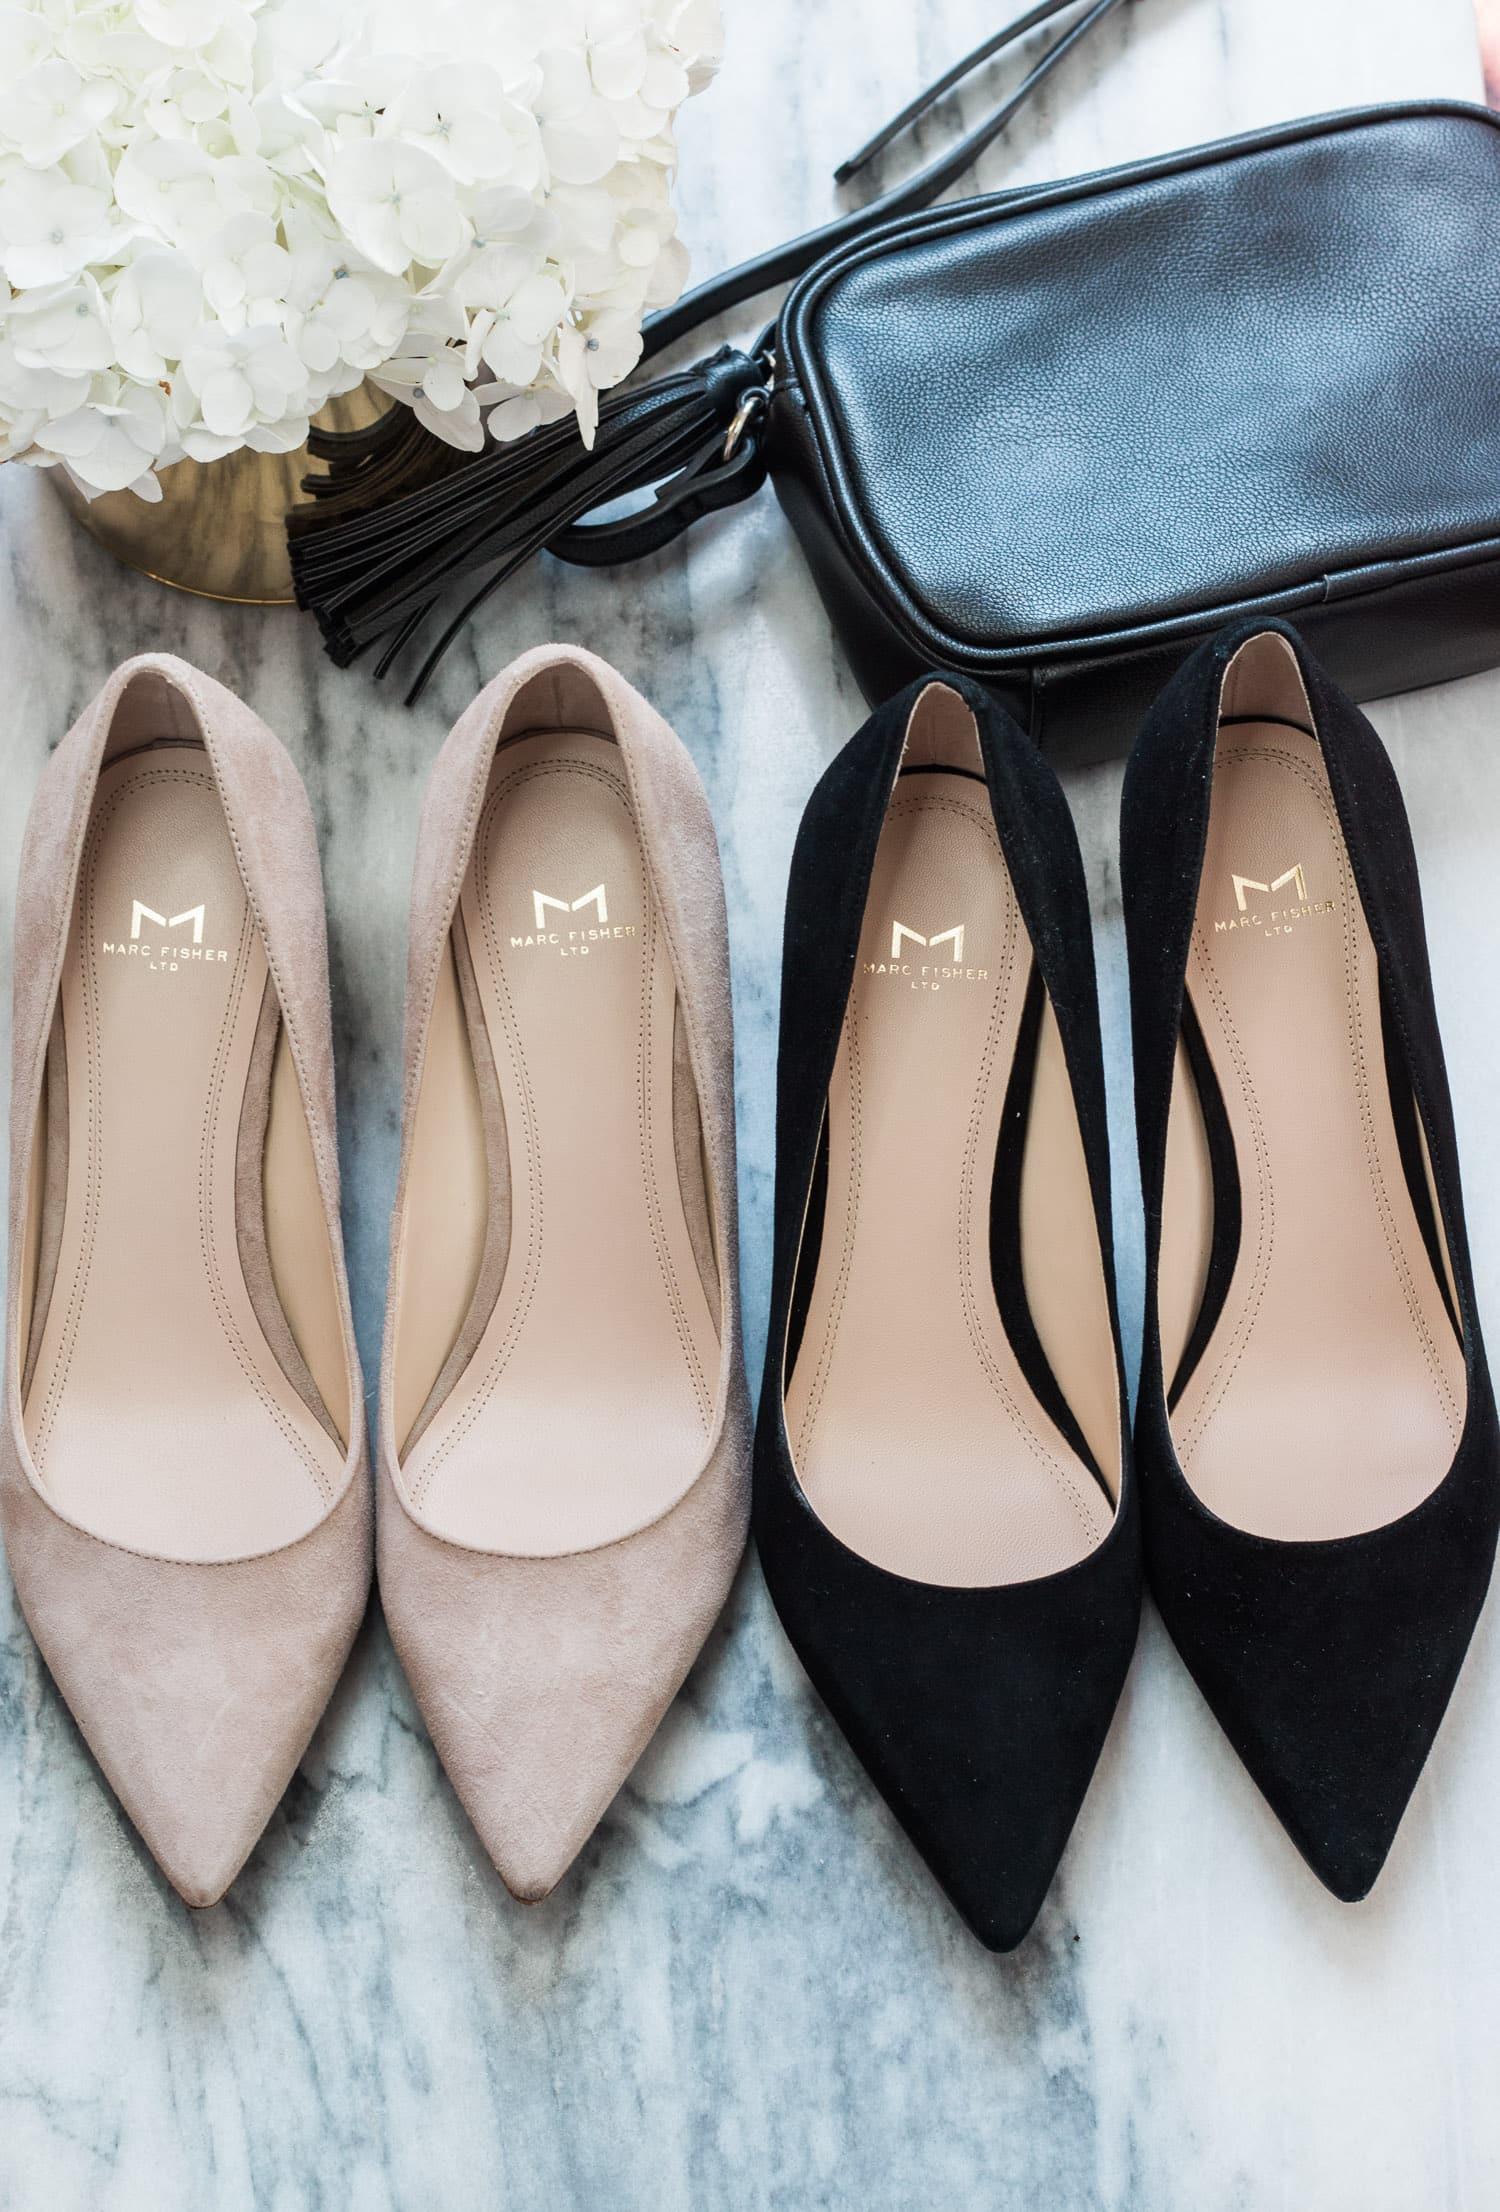 maternity style polka dot sun dress nude heels zappos shoes | Ashley Brooke Nicholas Florida style blogger